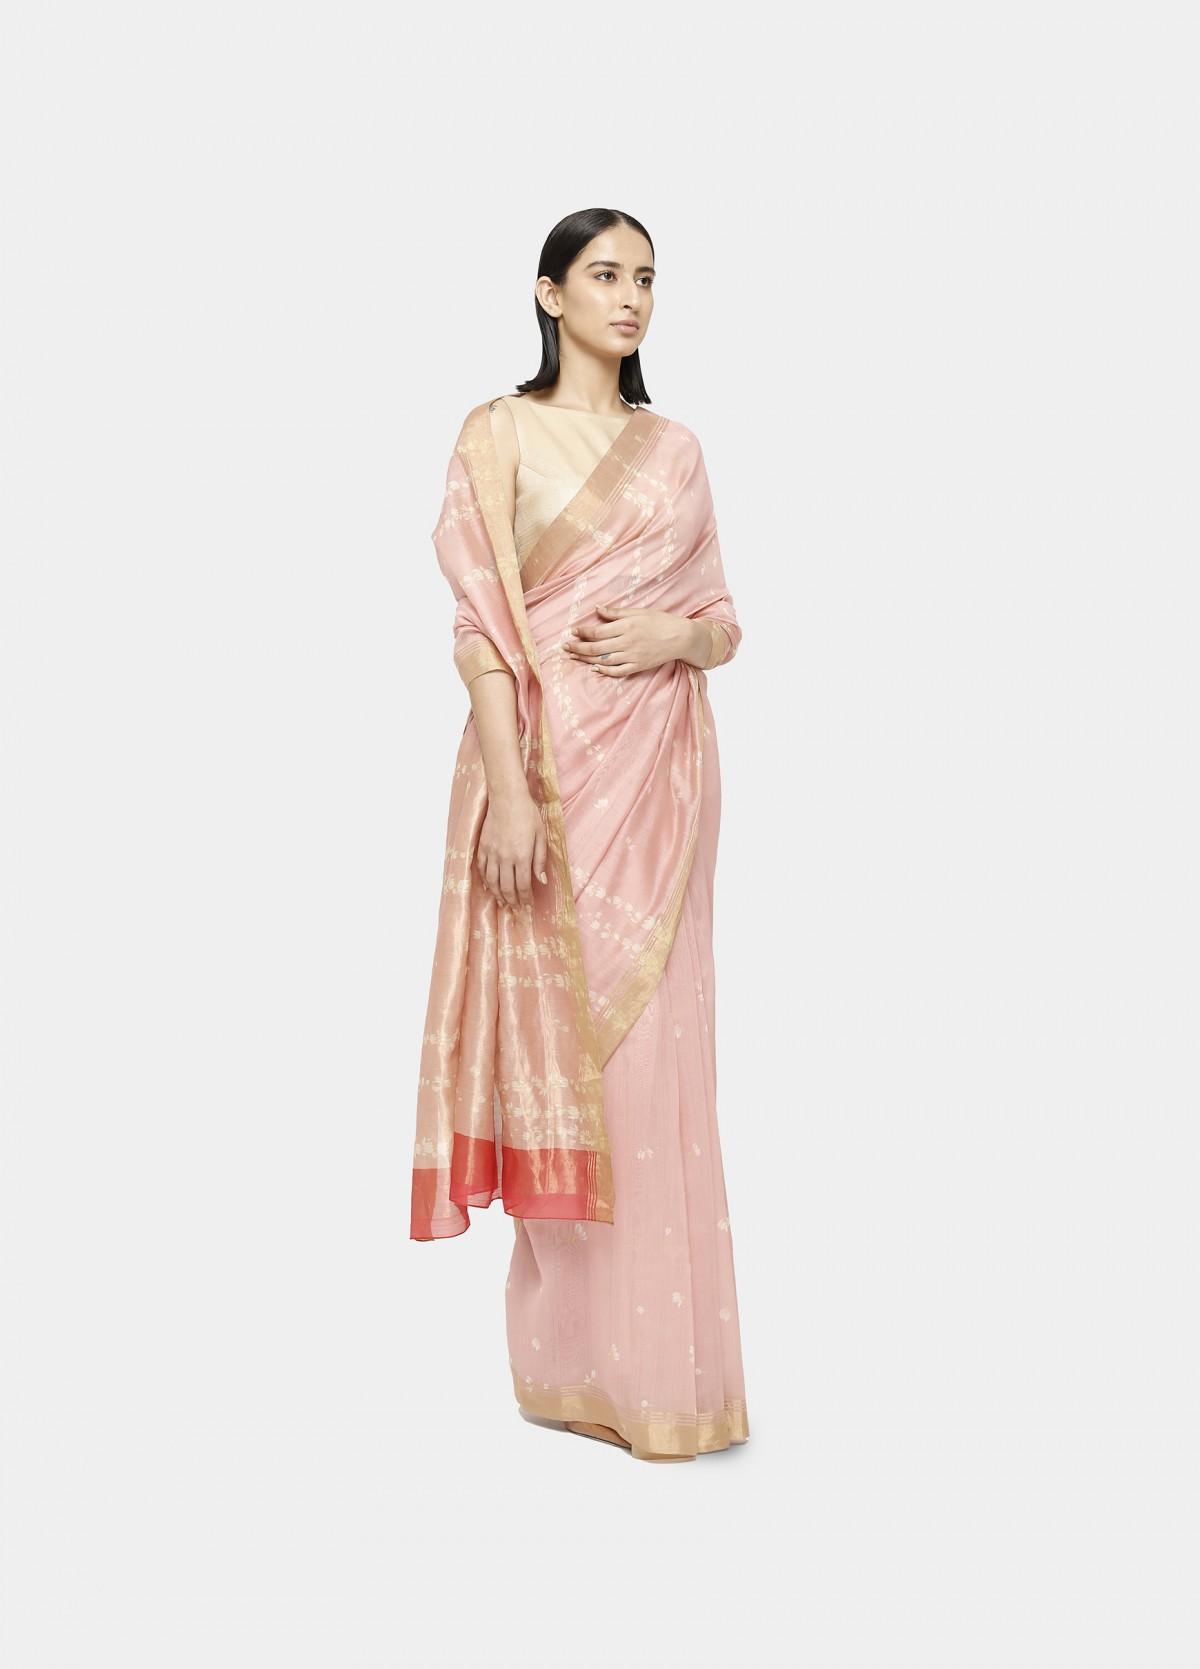 The Bijnor Sari